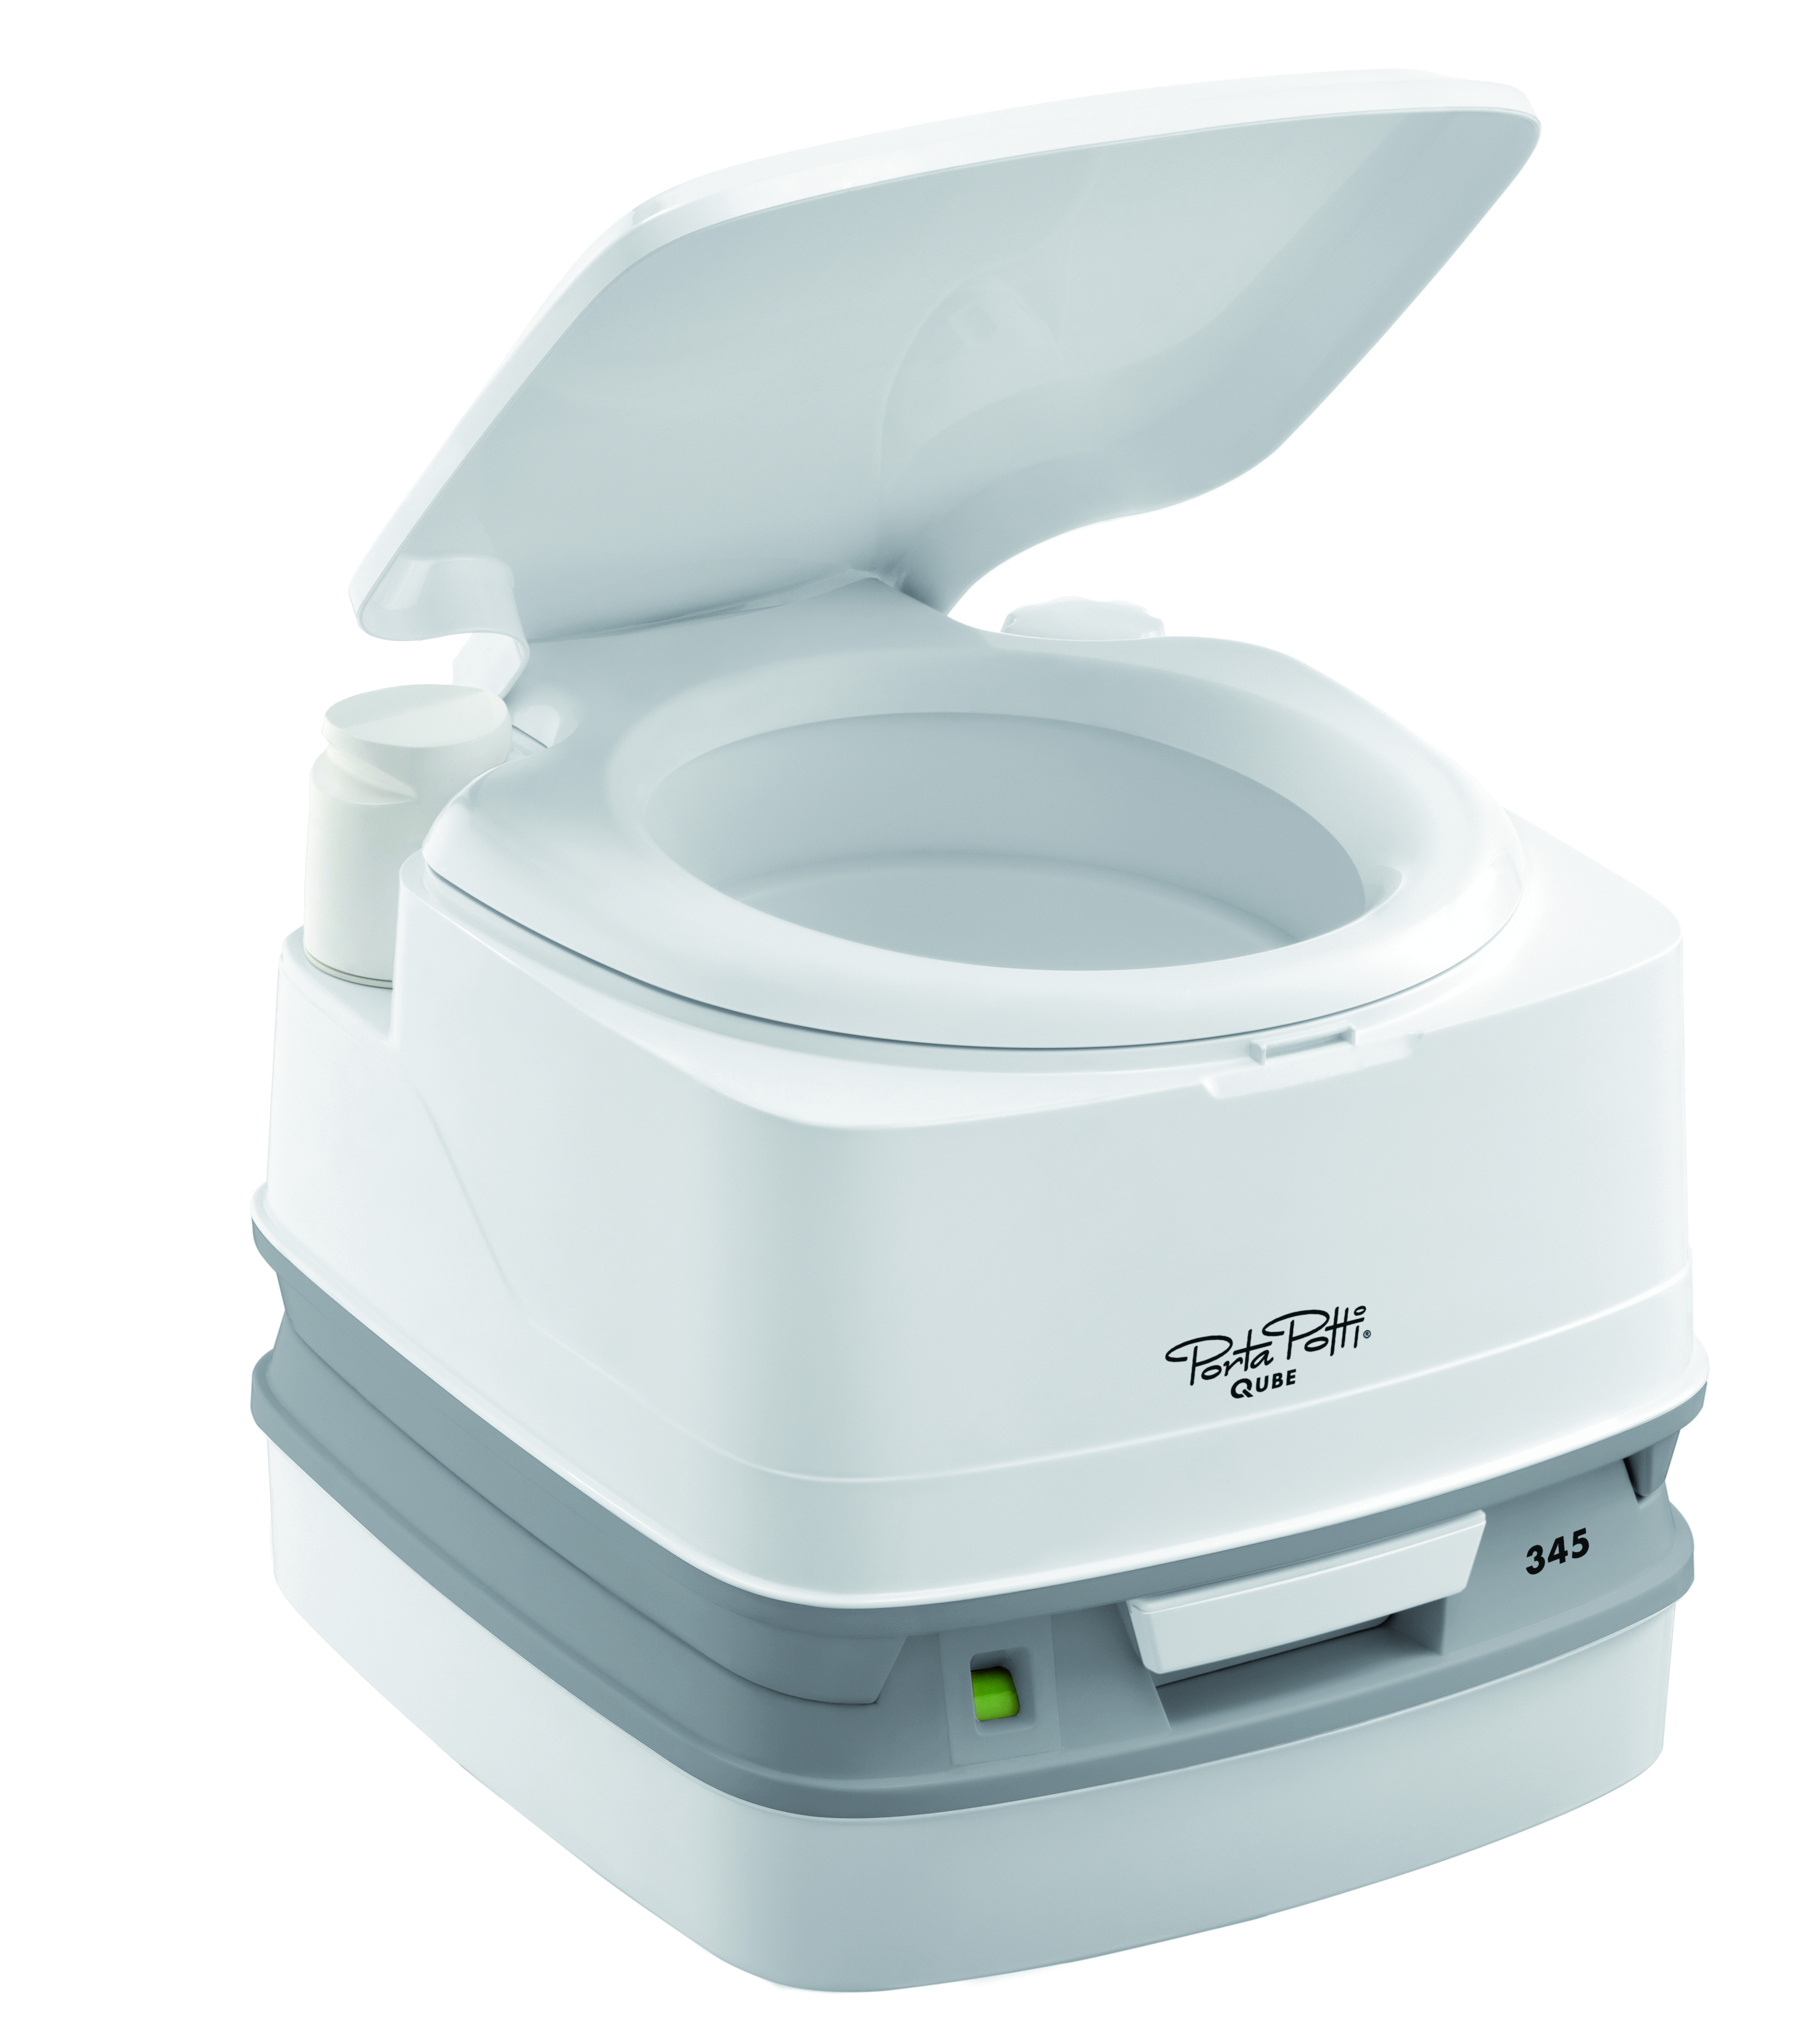 Porta Potti 335 Portabla Toaletter